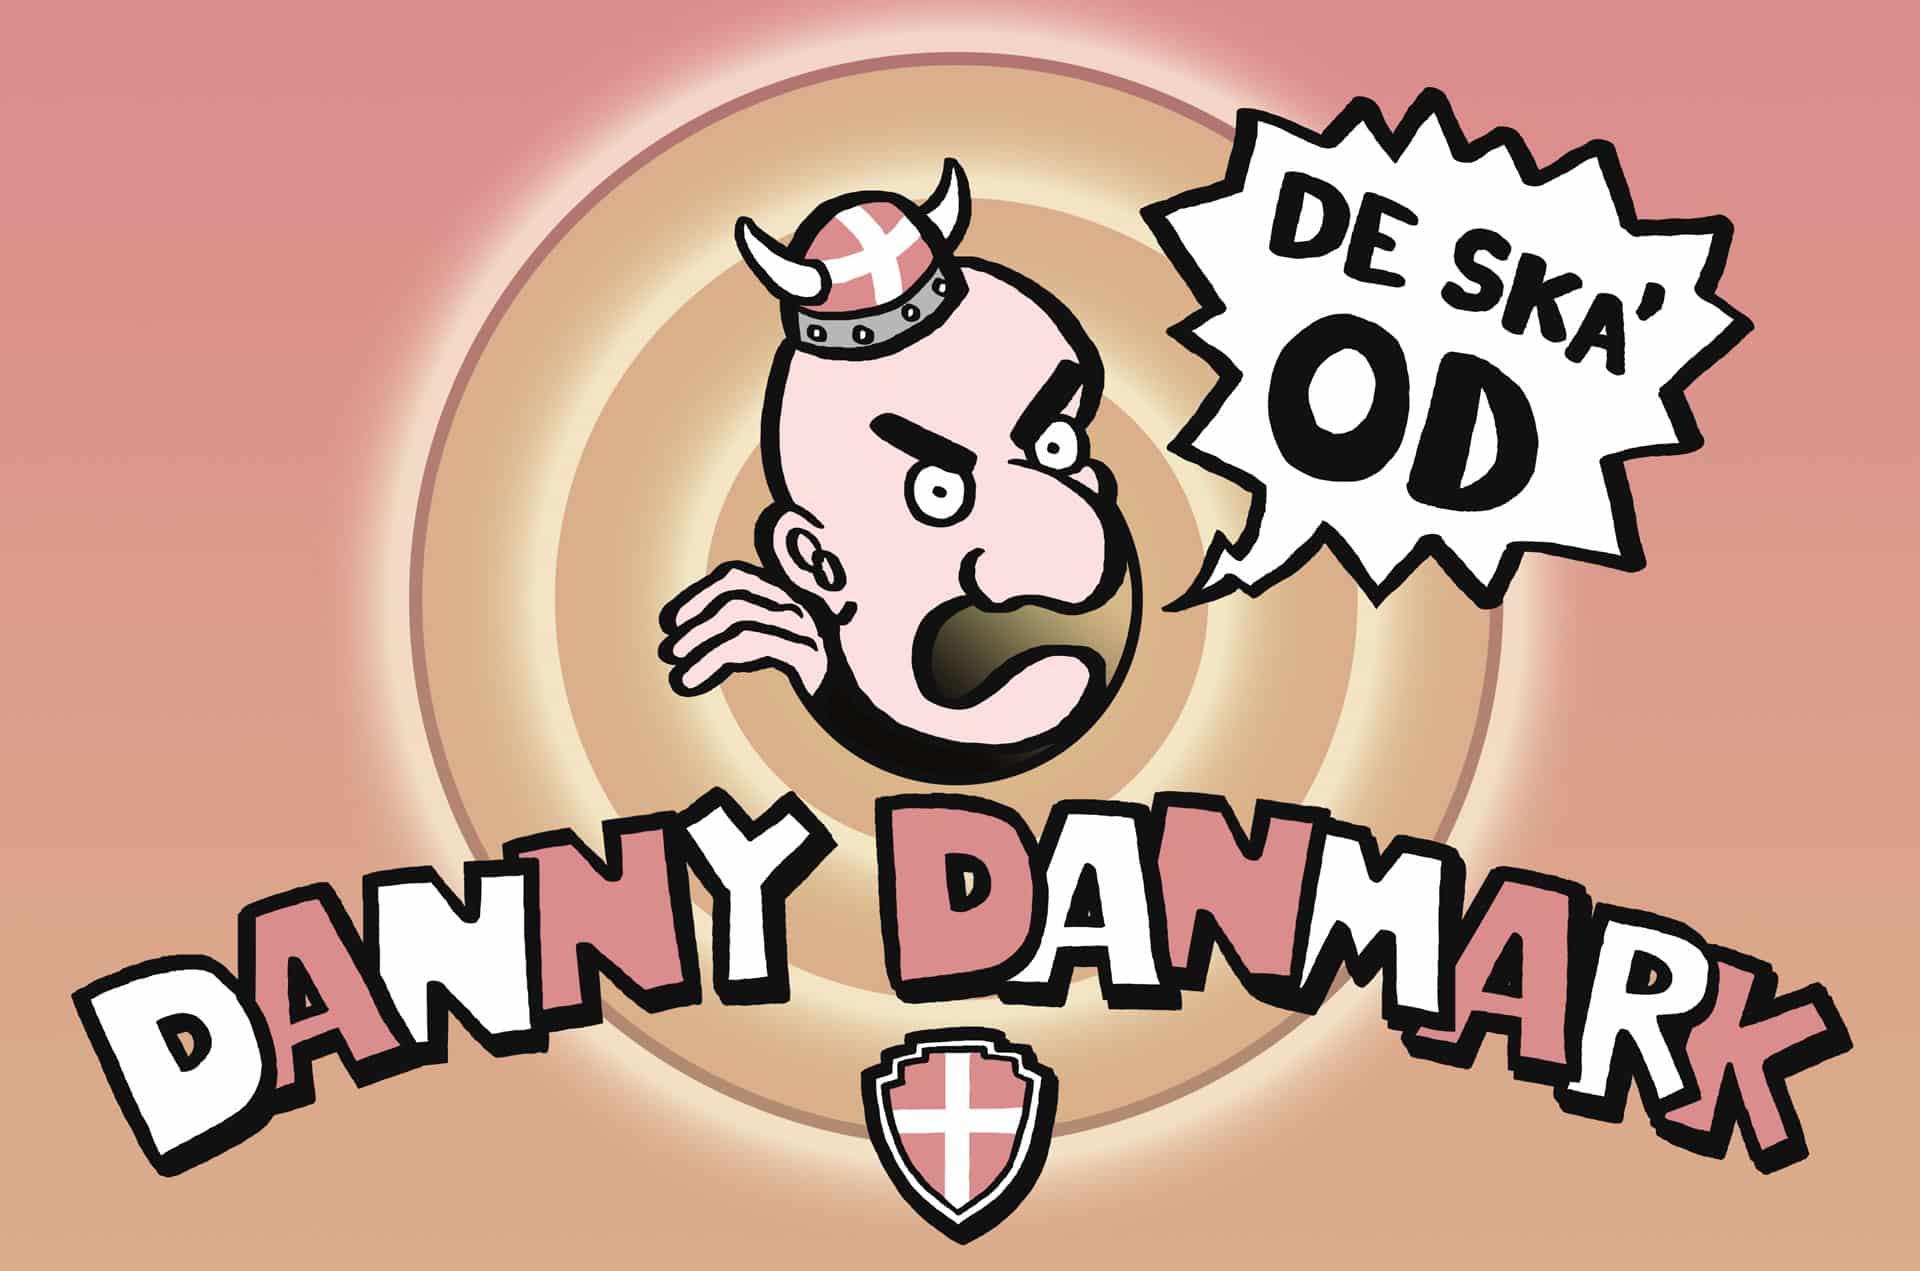 Danny Danmark